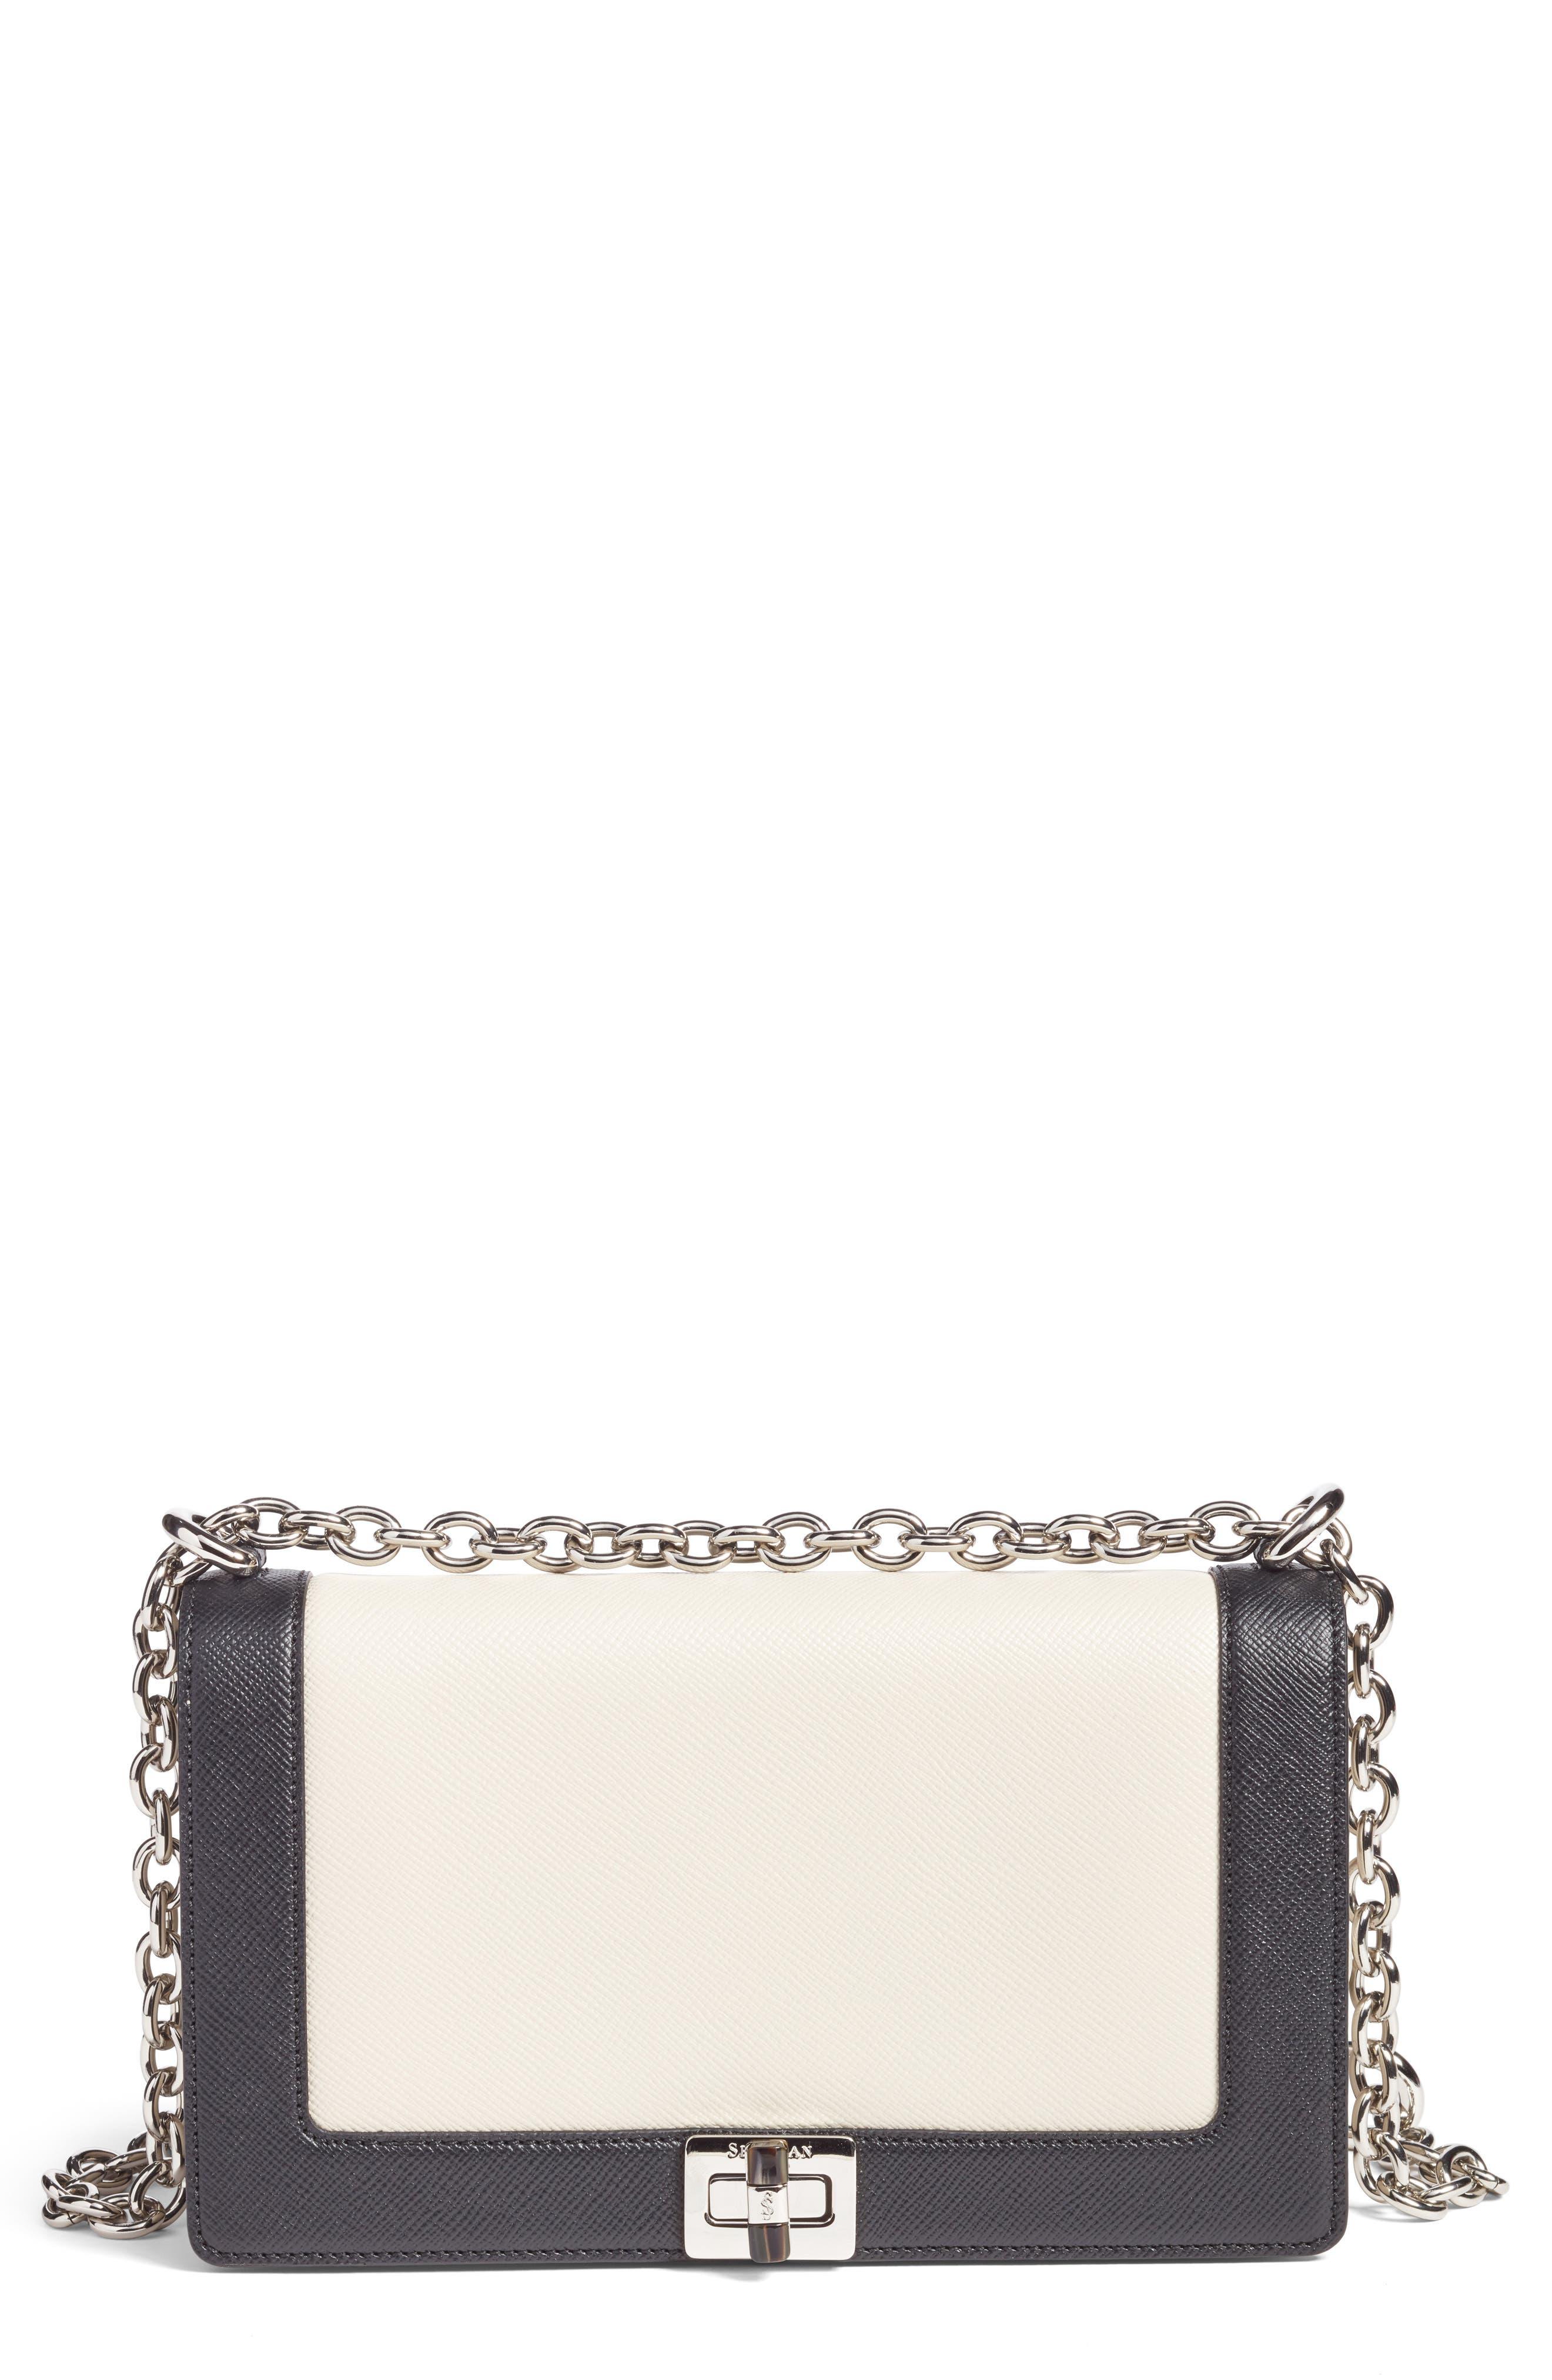 Roberta Evolution Leather Crossbody Bag,                         Main,                         color, 110